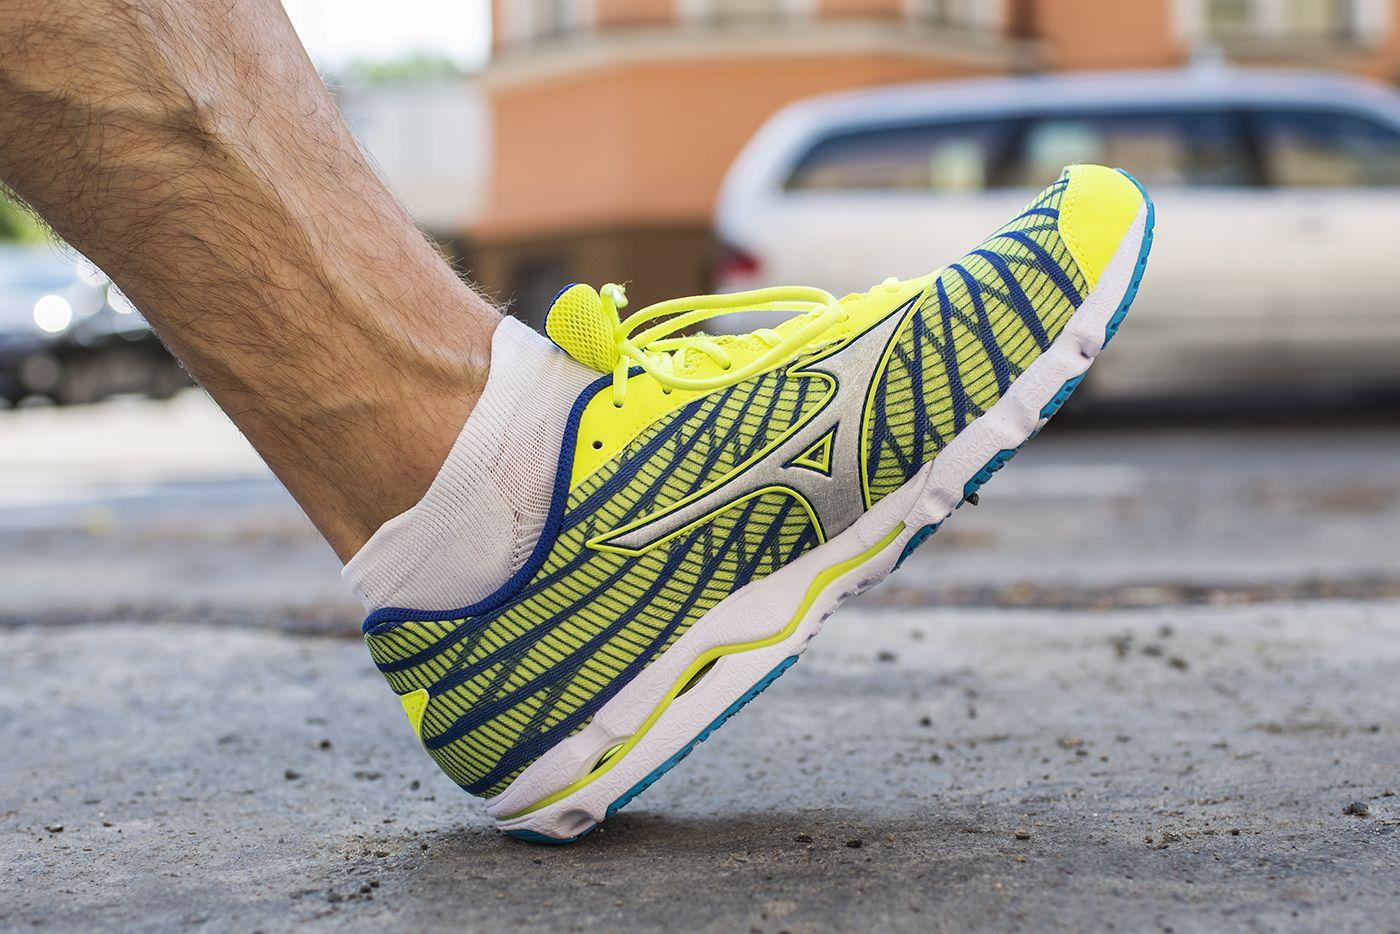 Mizuno Wave Hitogami 4 To But Startowy Przeznaczony Dla Osob Z Neutralnym Typem Stopy Hoka Running Shoes Running Shoes Sneakers